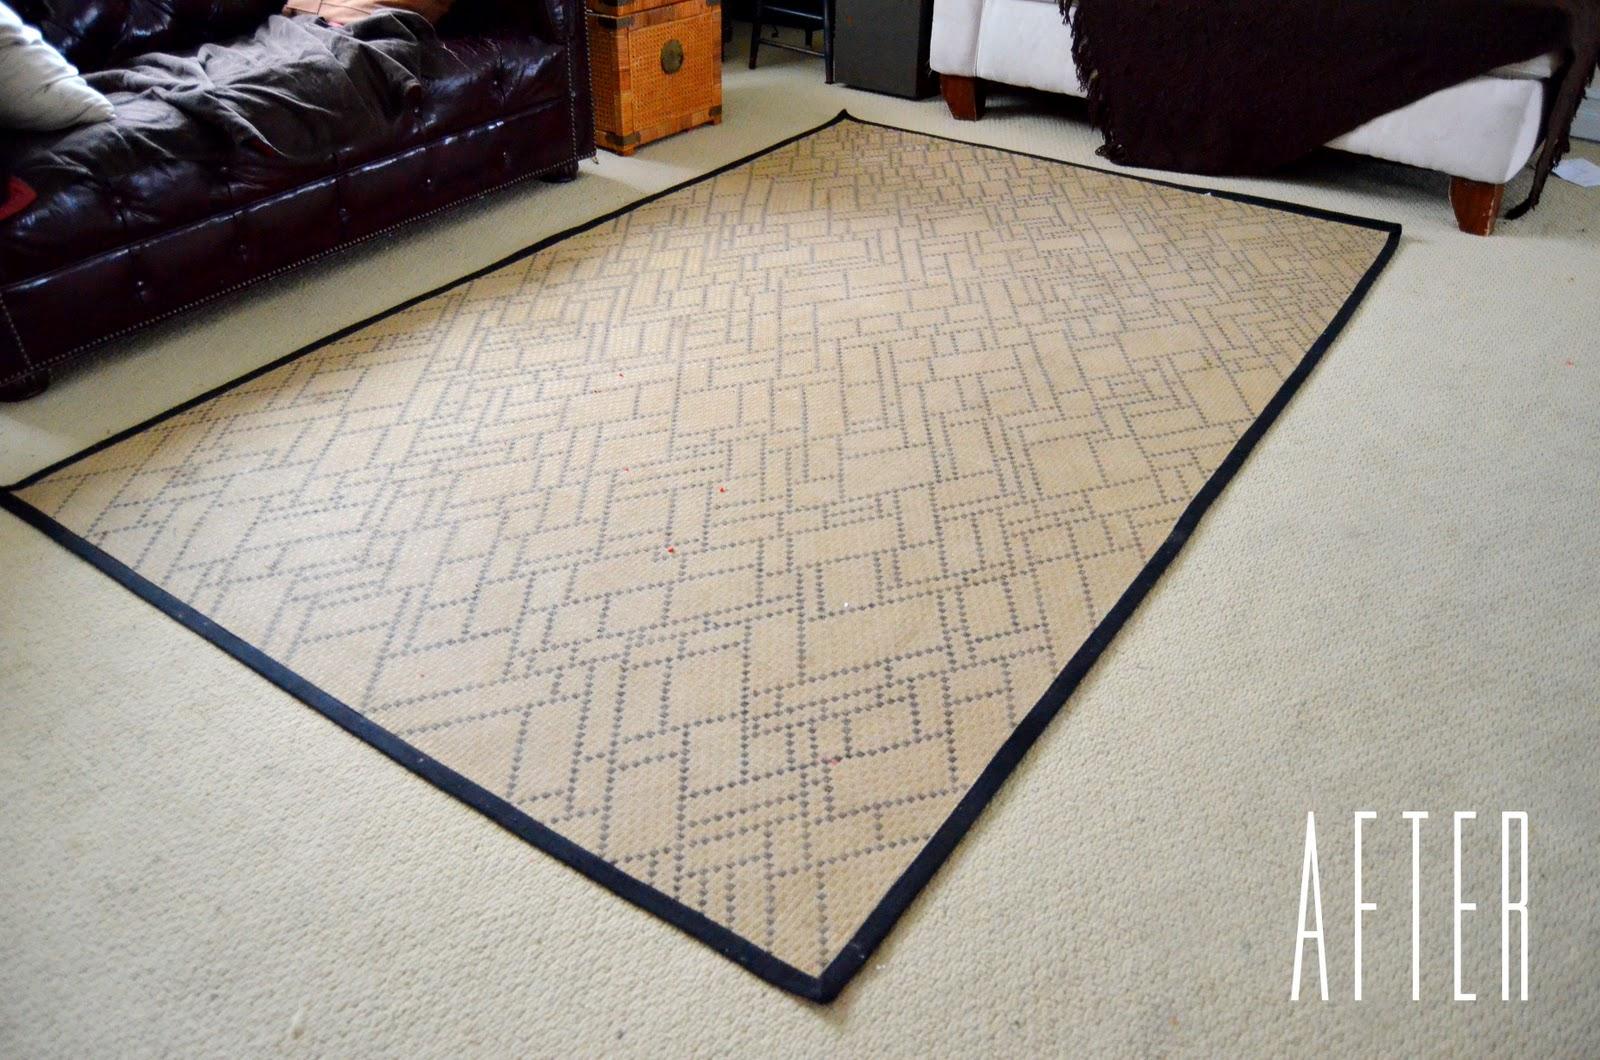 DIY sharpie decorated rug